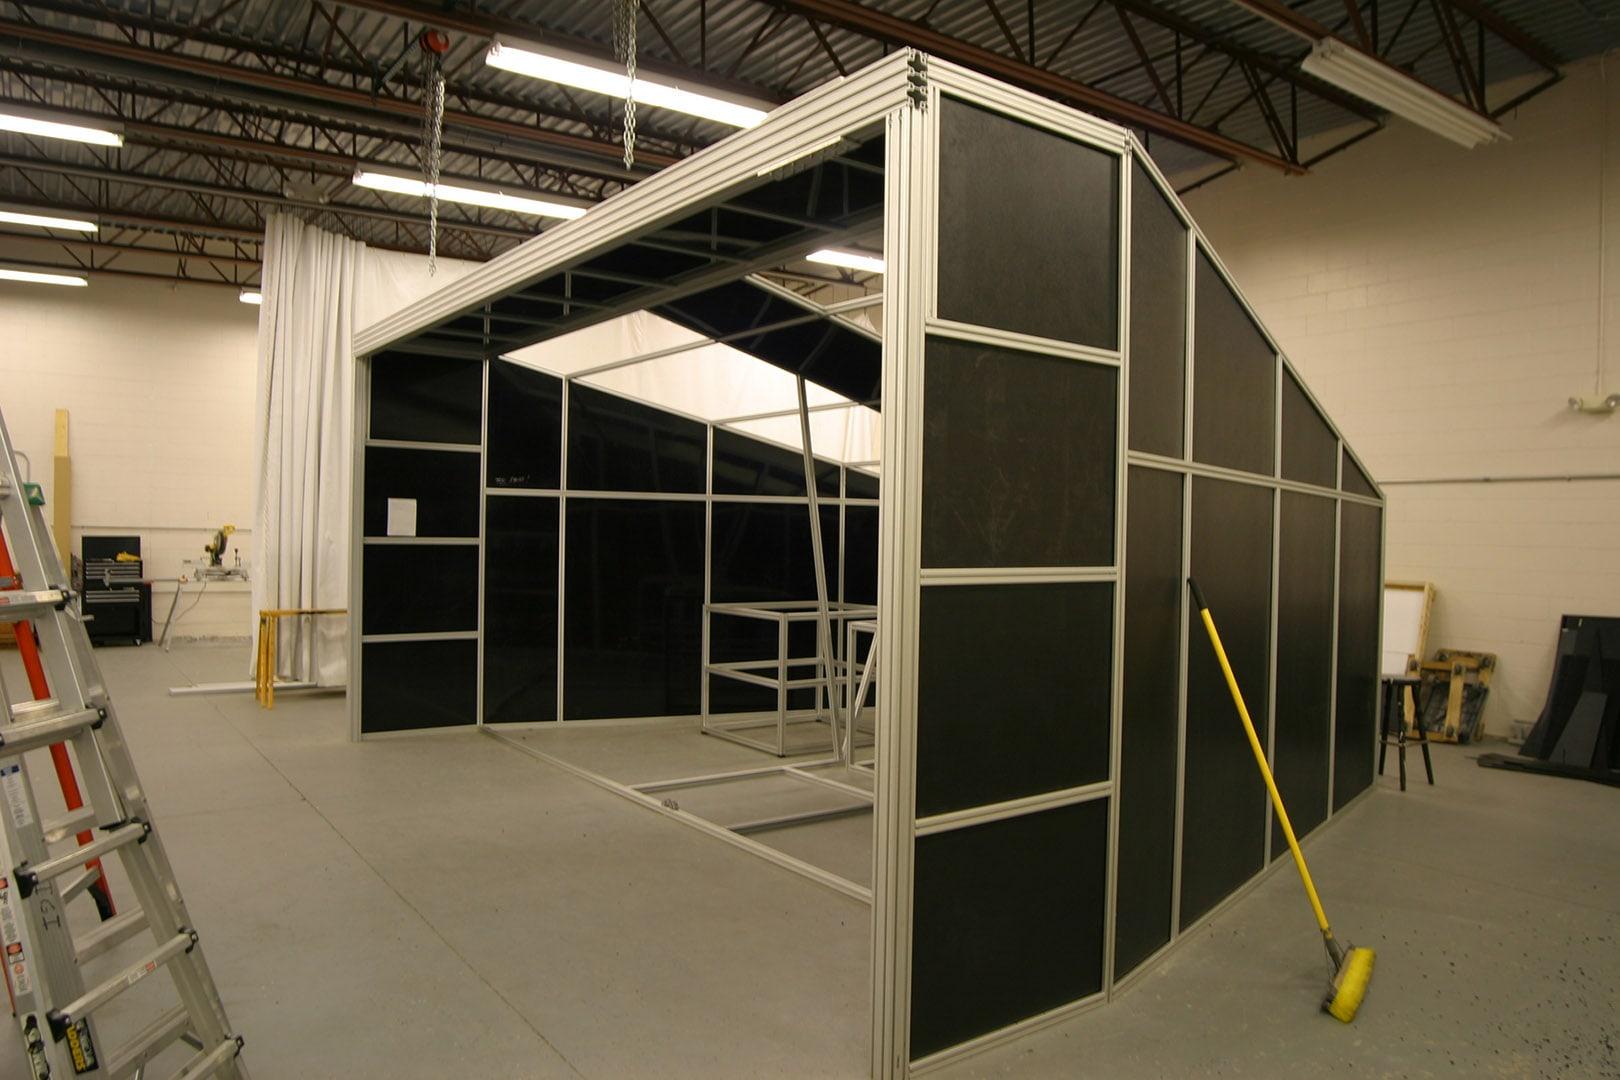 IGI install PowerWindow equipment virtual reality system